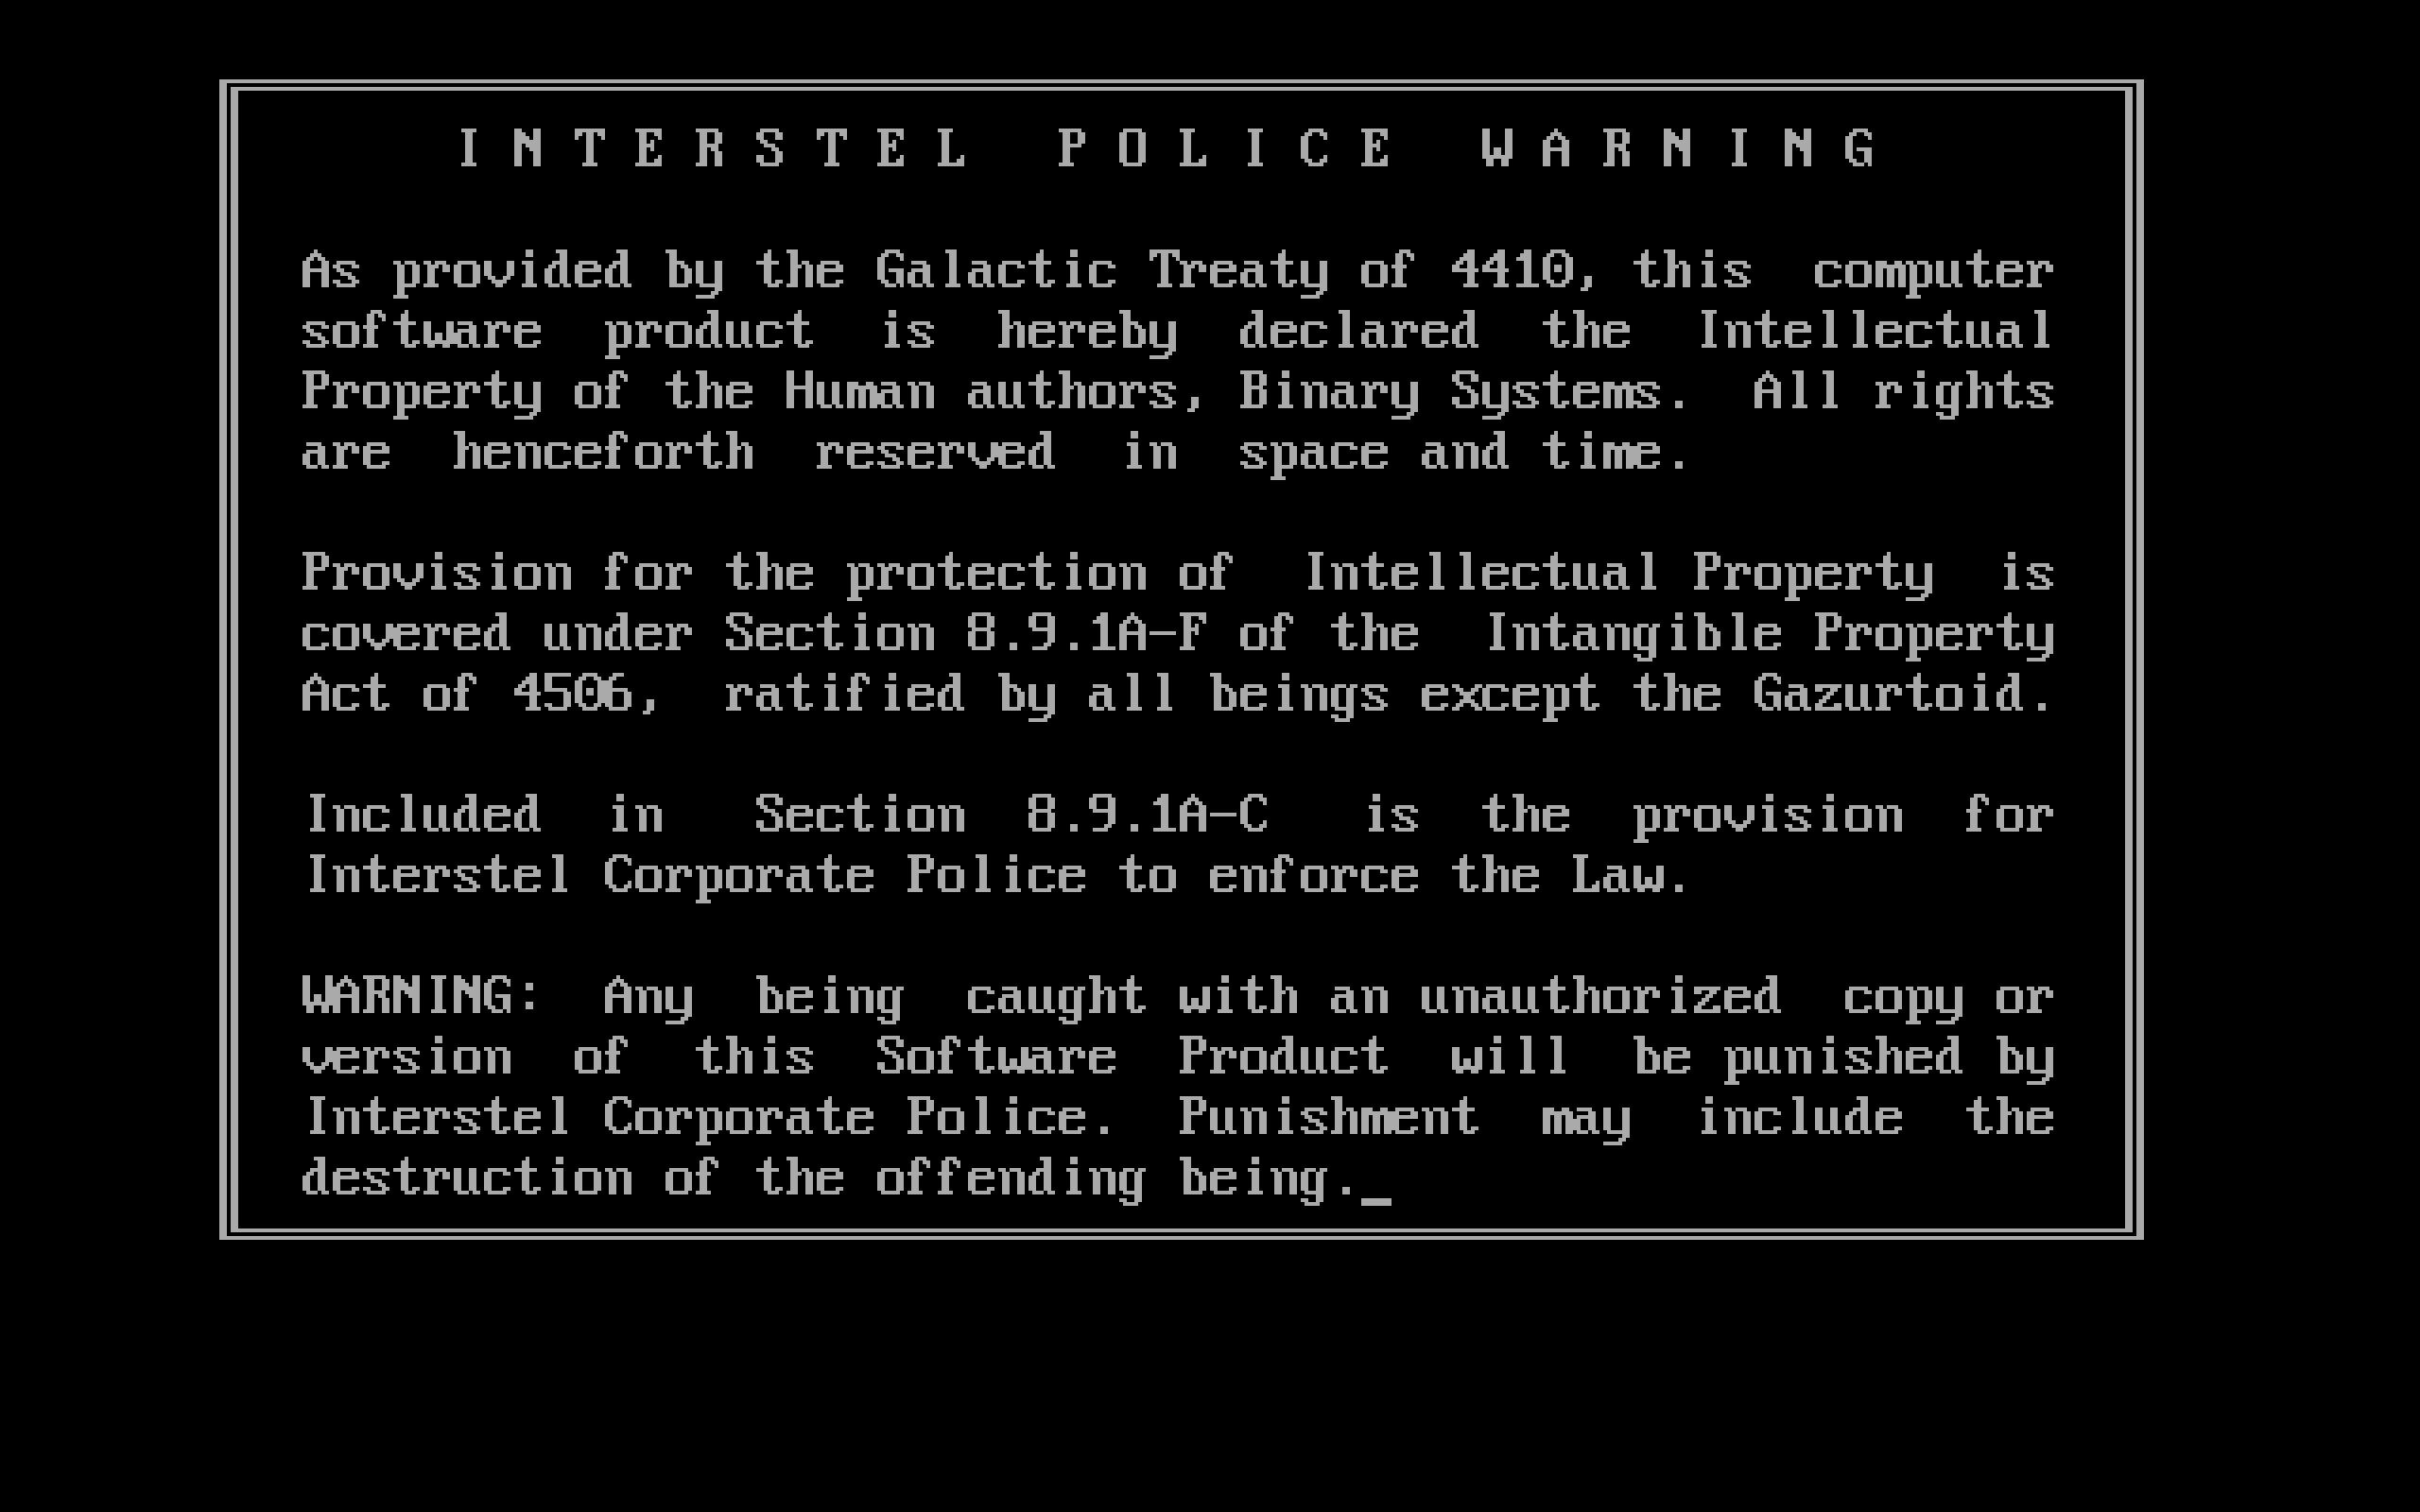 Warning Screen Shot (Original)